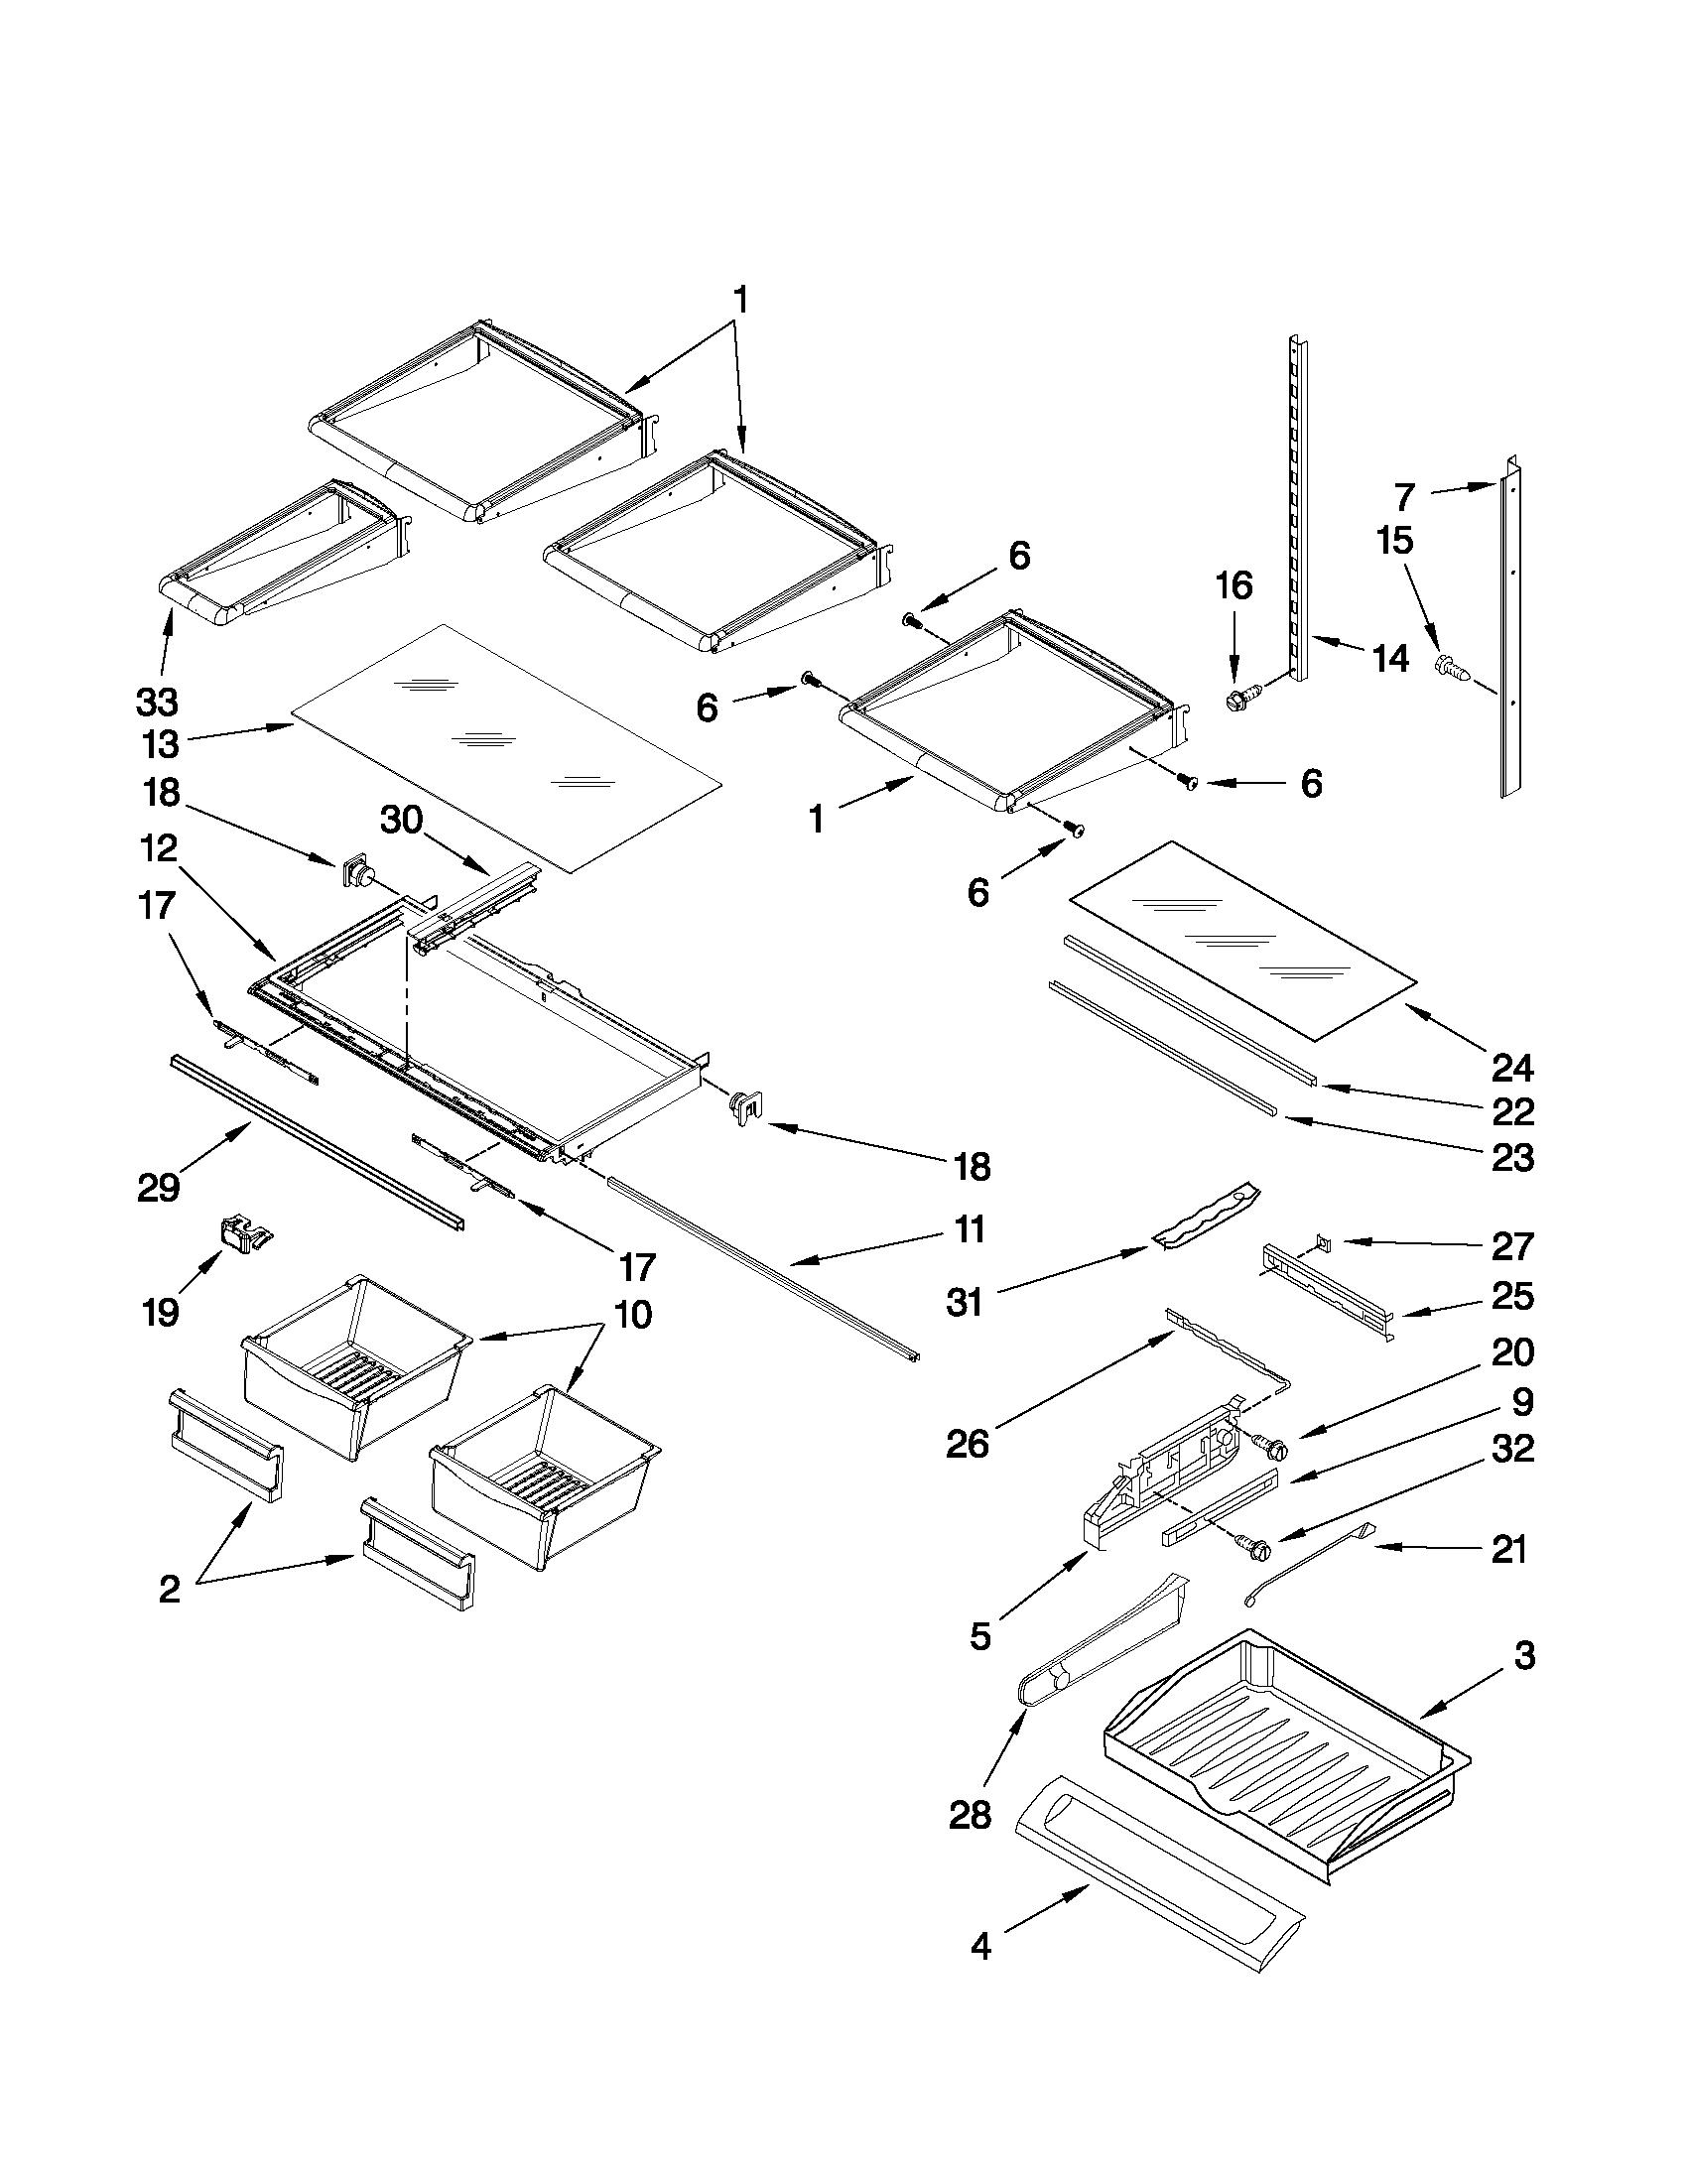 Whirlpool model GI6FDRXXY02 bottom-mount refrigerator